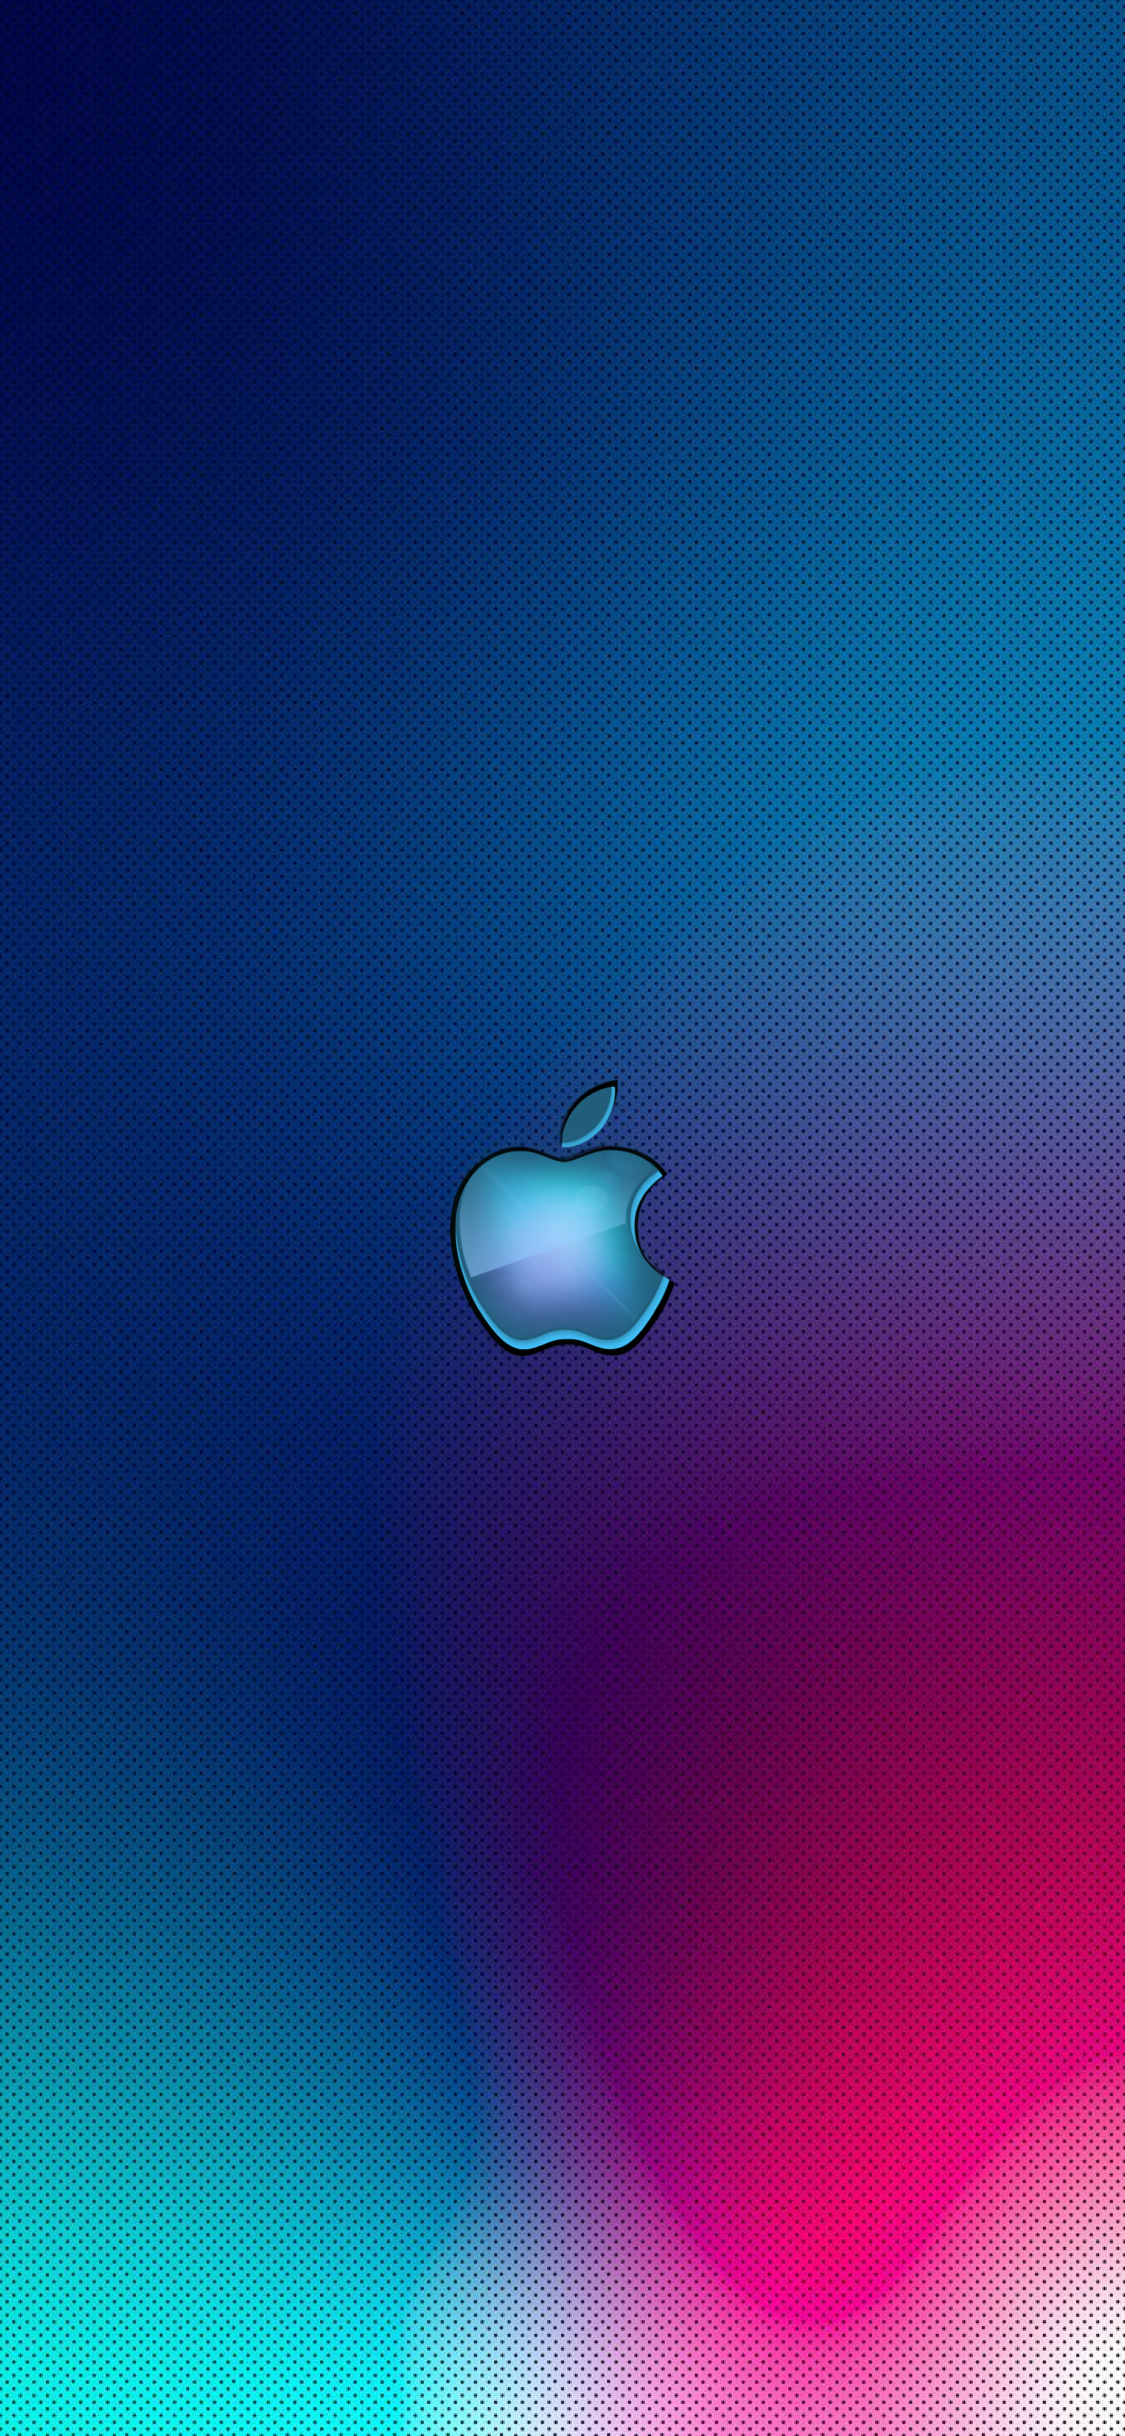 Pin By Dmitrij On Yabloko Oboi Apple Logo Wallpaper Apple Wallpaper Apple Iphone Wallpaper Hd